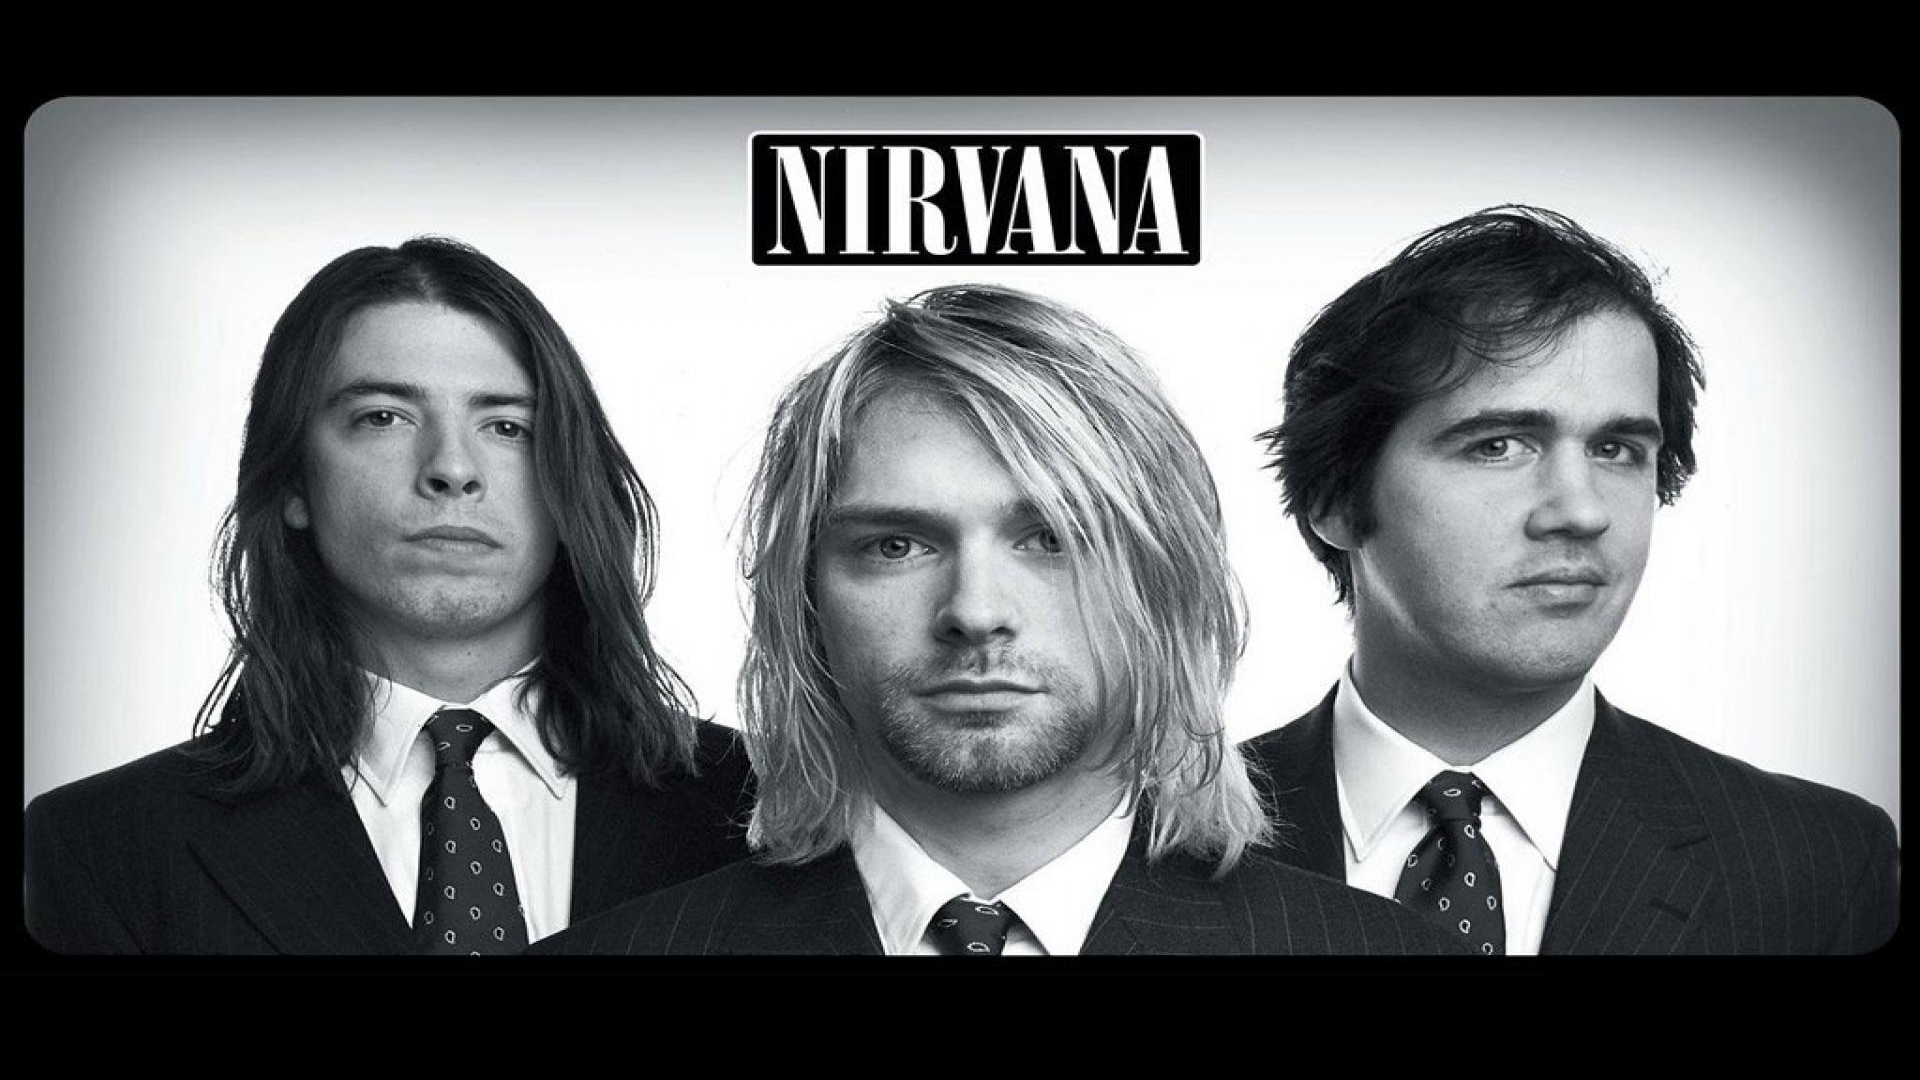 Nirvana Band Members Suits Look 2401 1920x1080